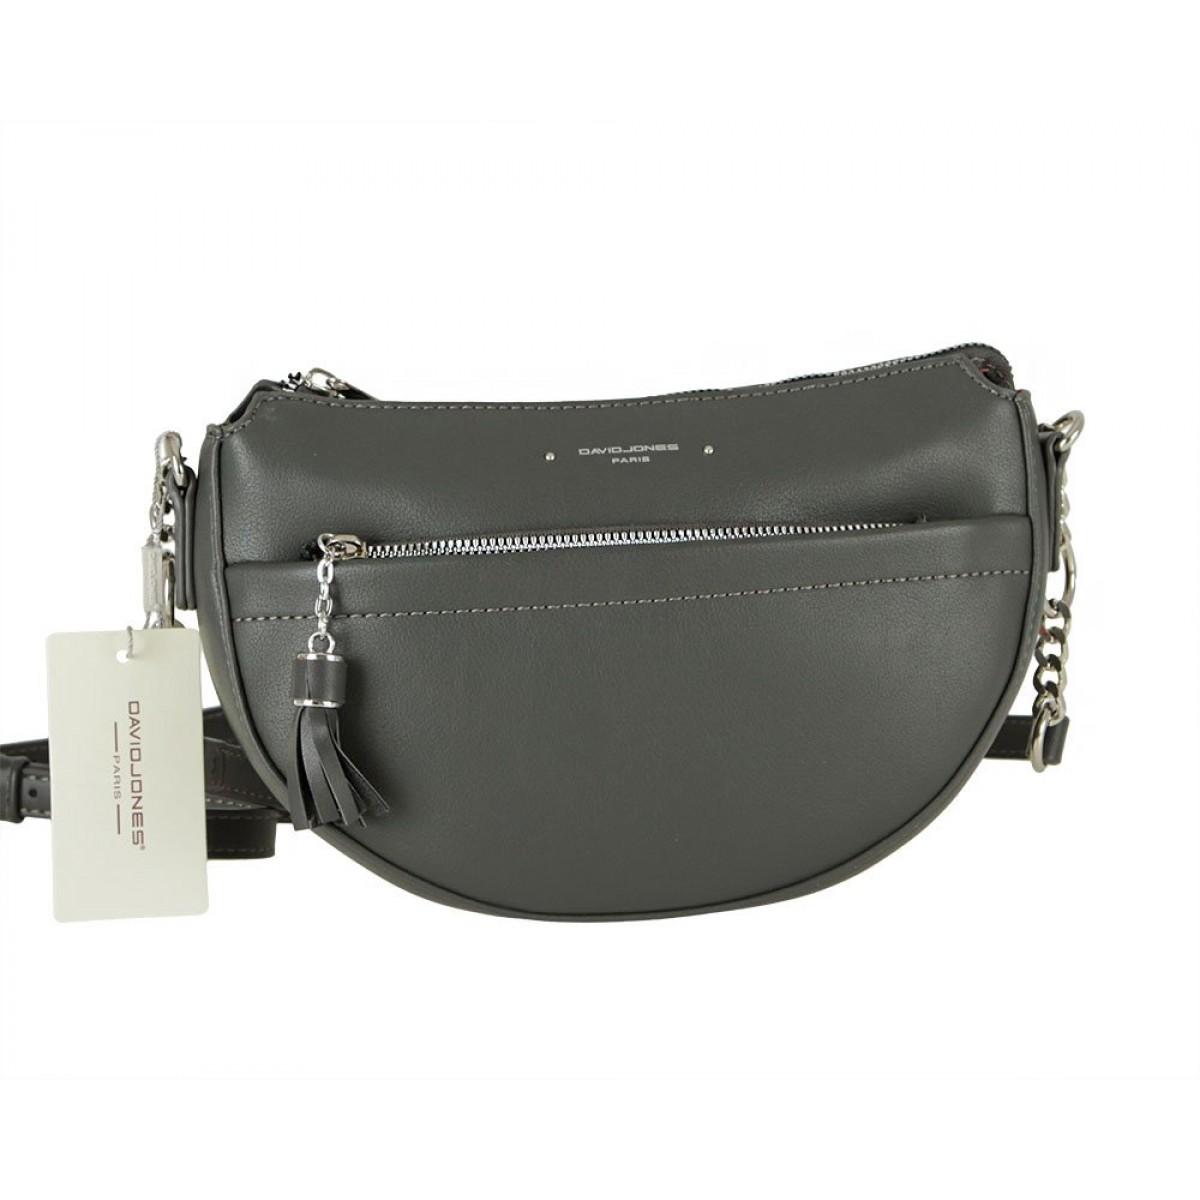 Жіноча сумка David Jones 6415-2 D.GREY